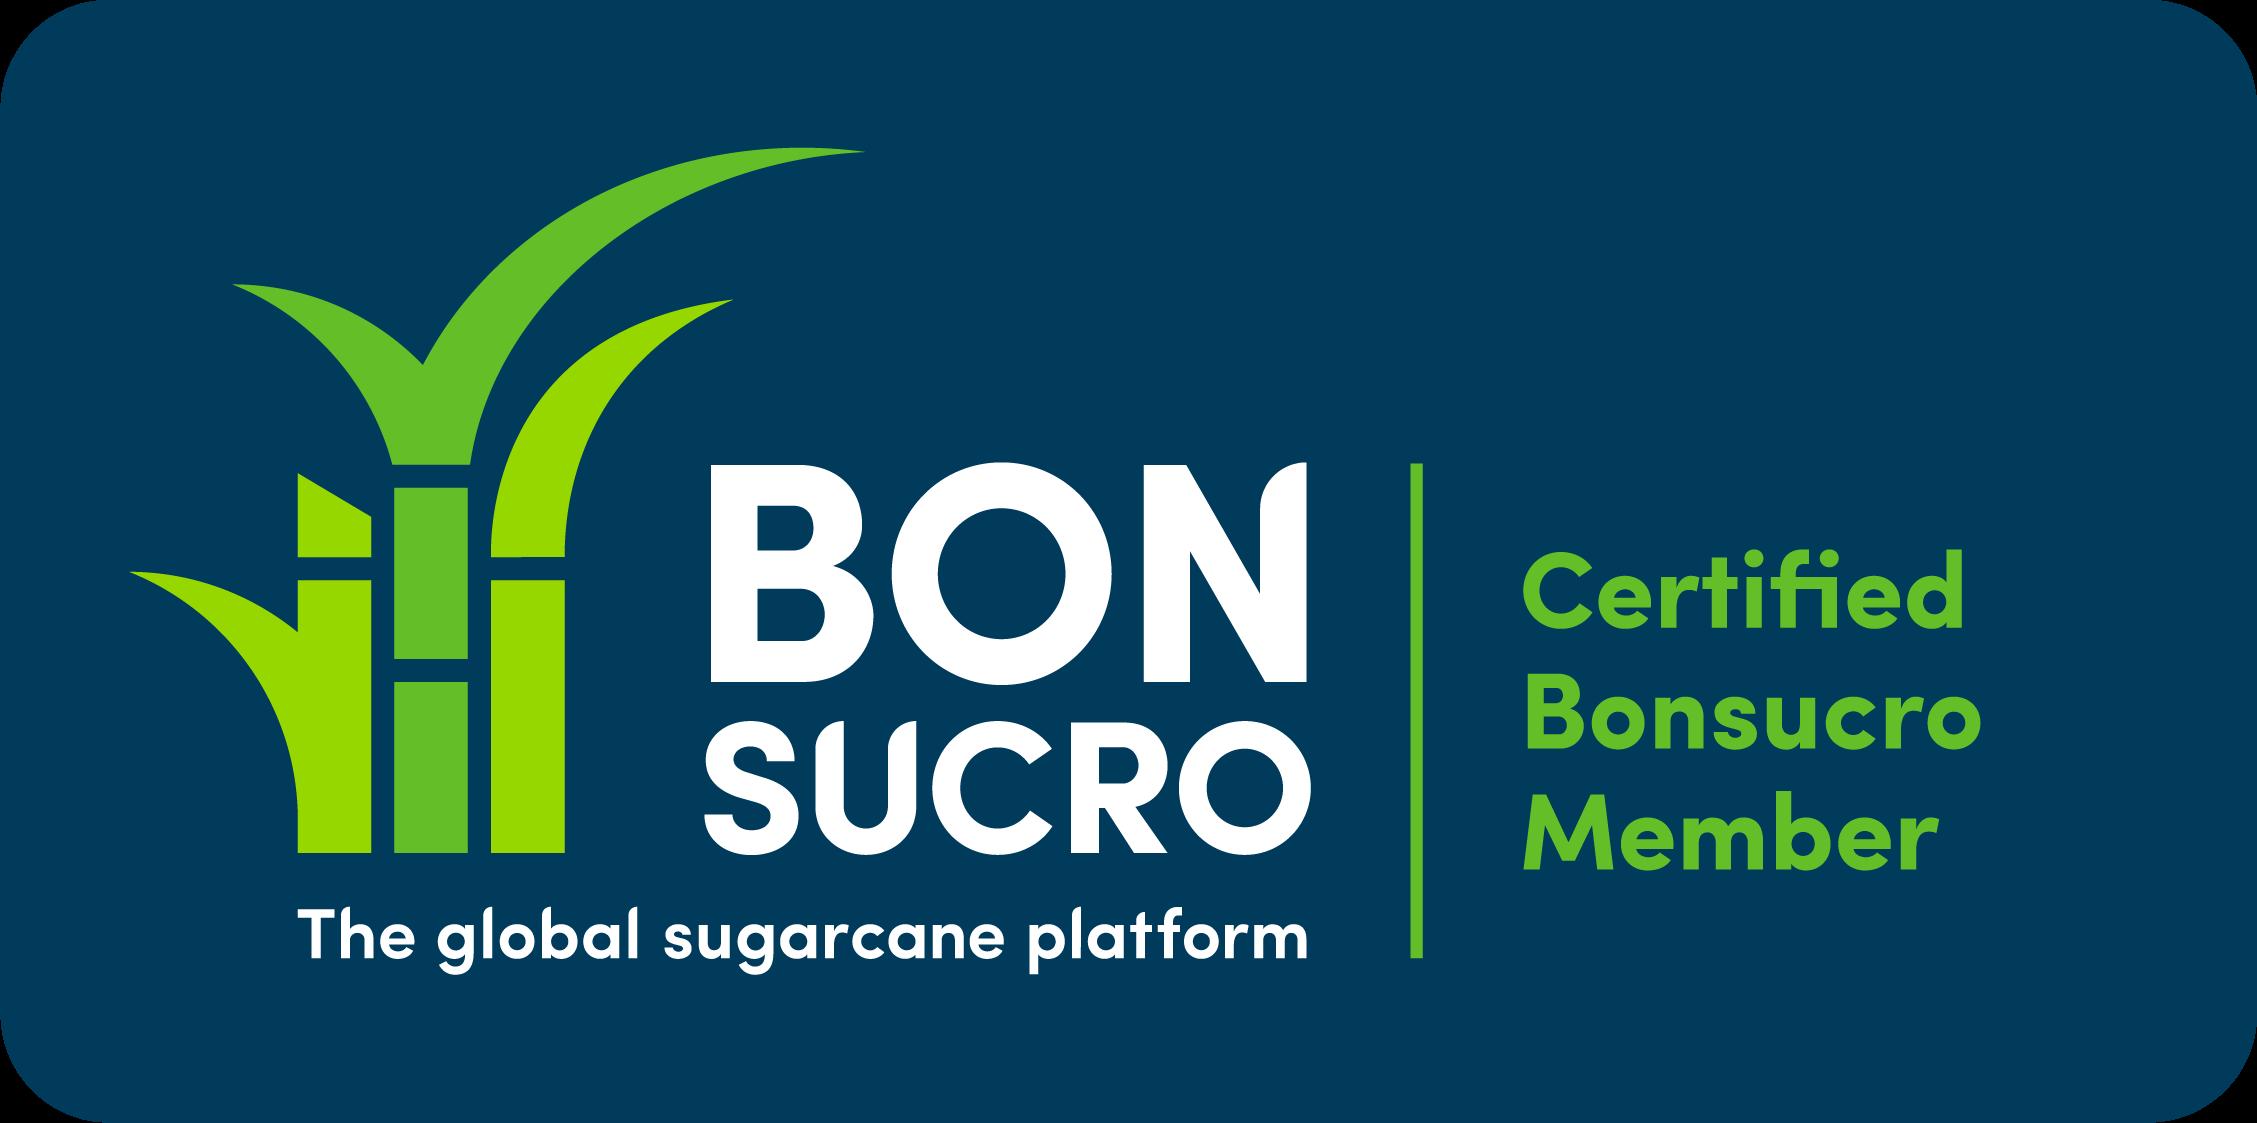 Bonsucro Certified Member logo